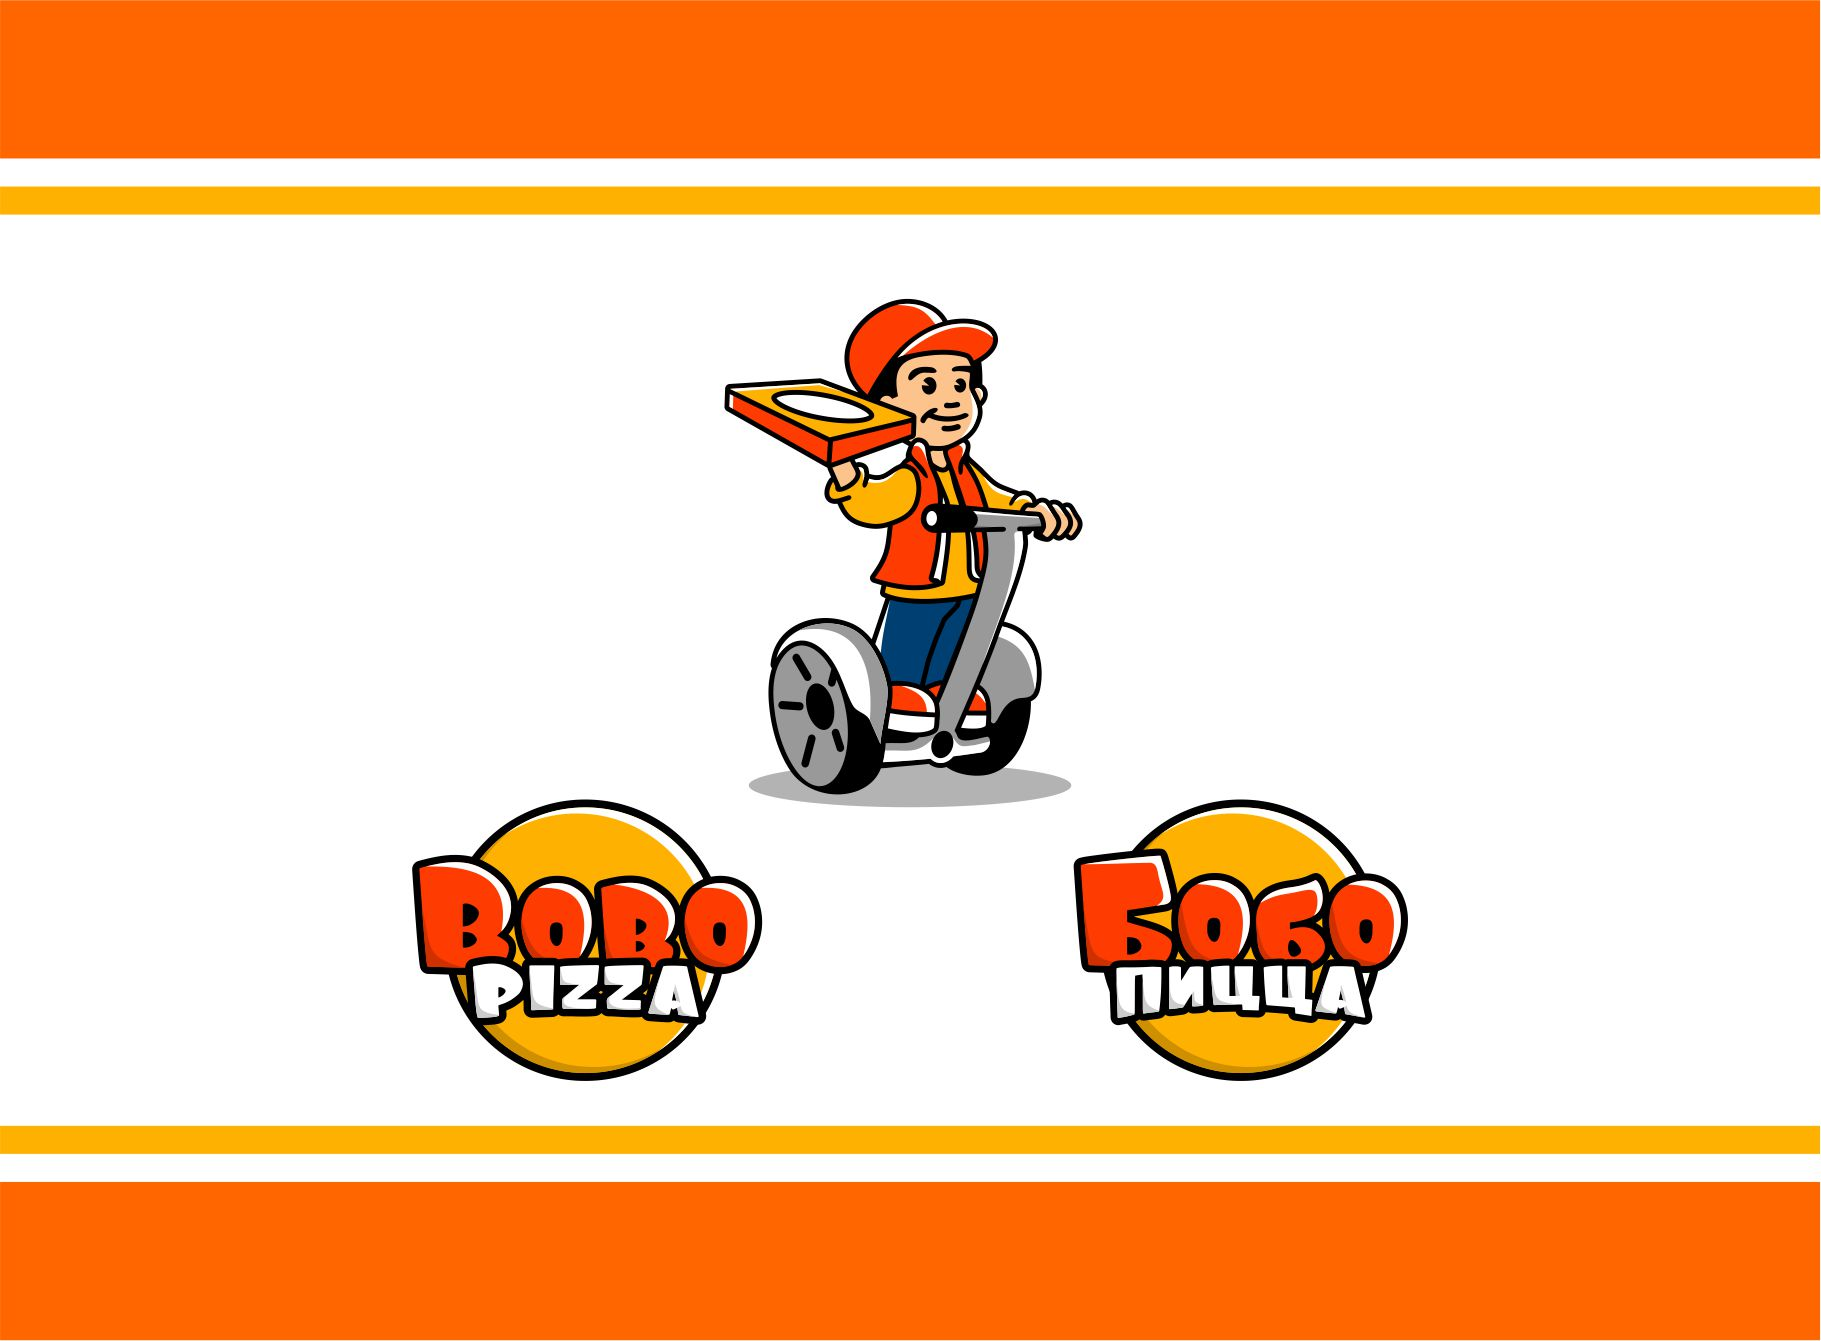 конкурс 1 место. Персонаж и логотип для пиццерии BoboPizza